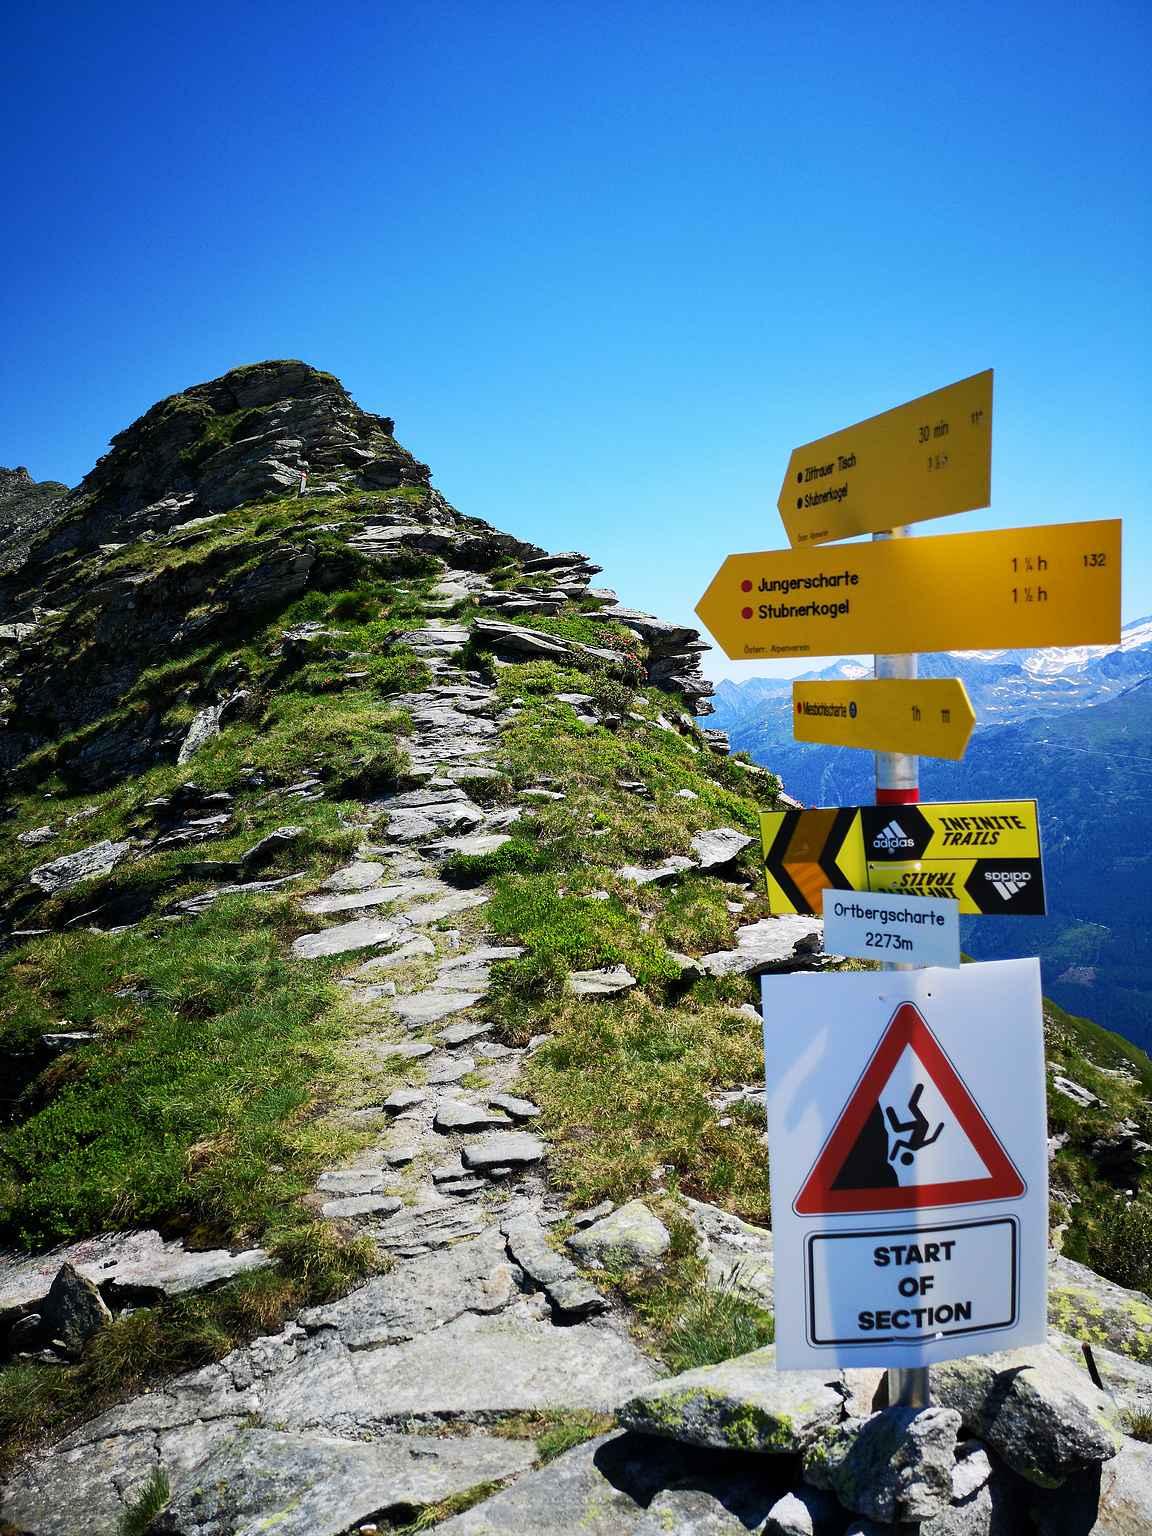 Ortbergscharte 2273 m